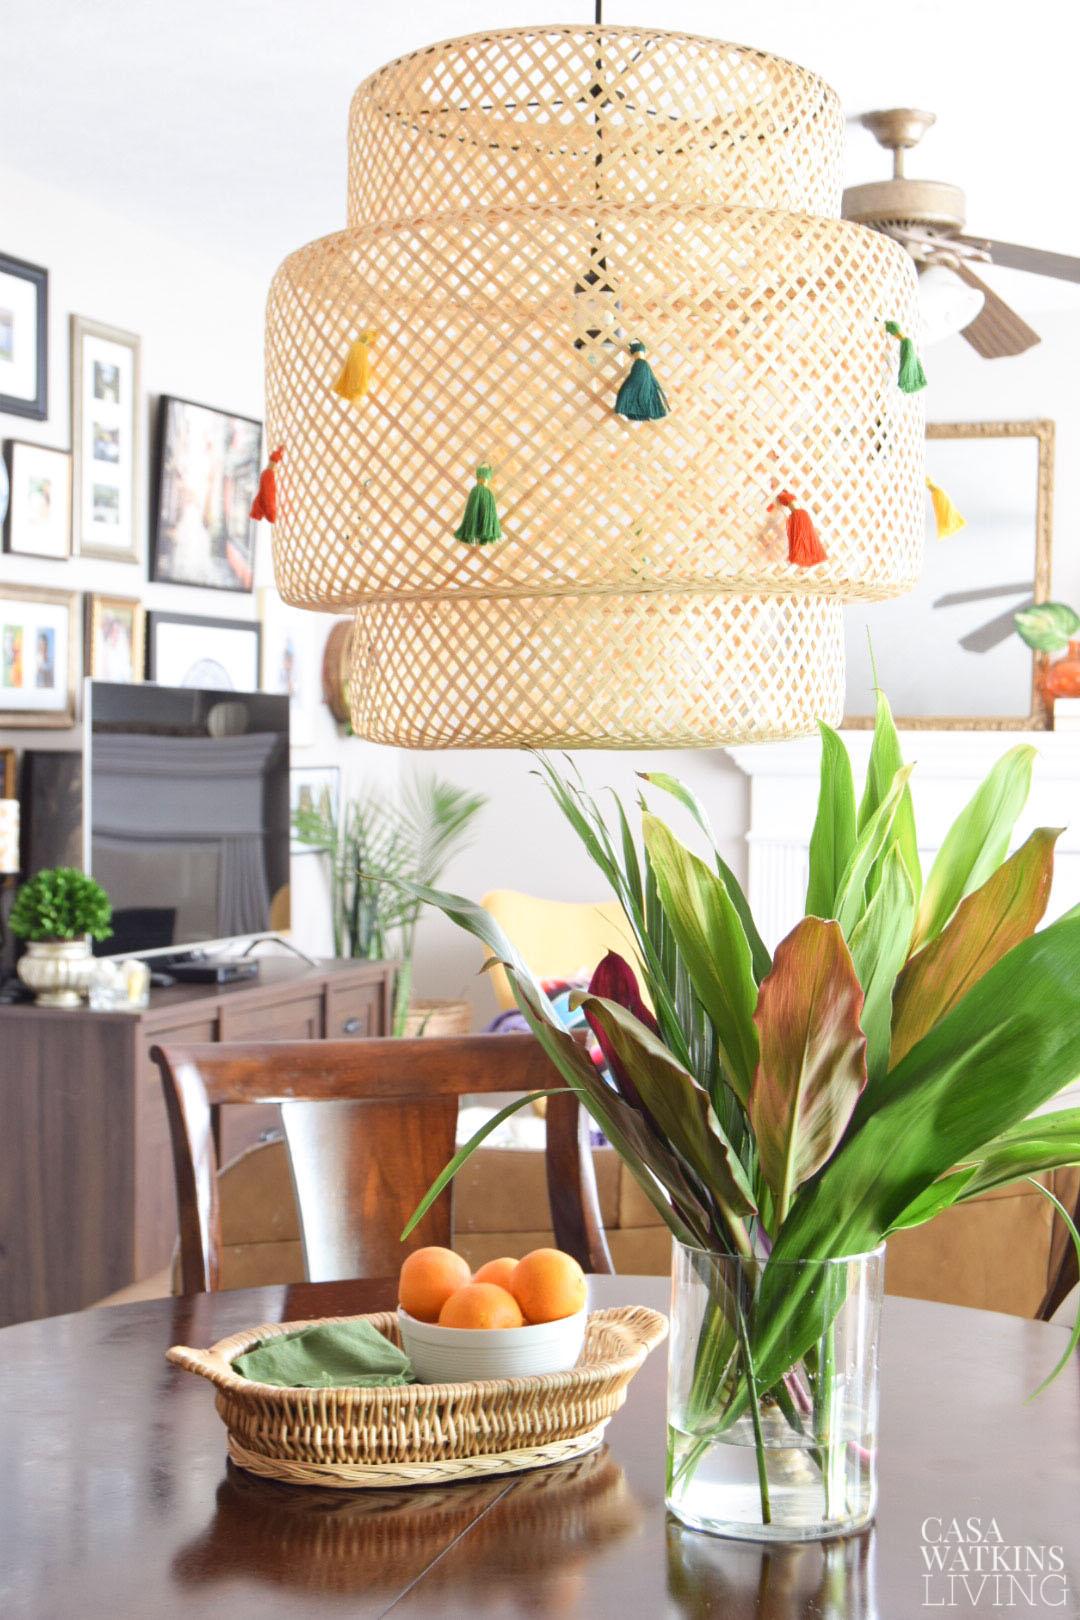 Diy Ikea Lamp Makeover Ideas Casa Watkins Living